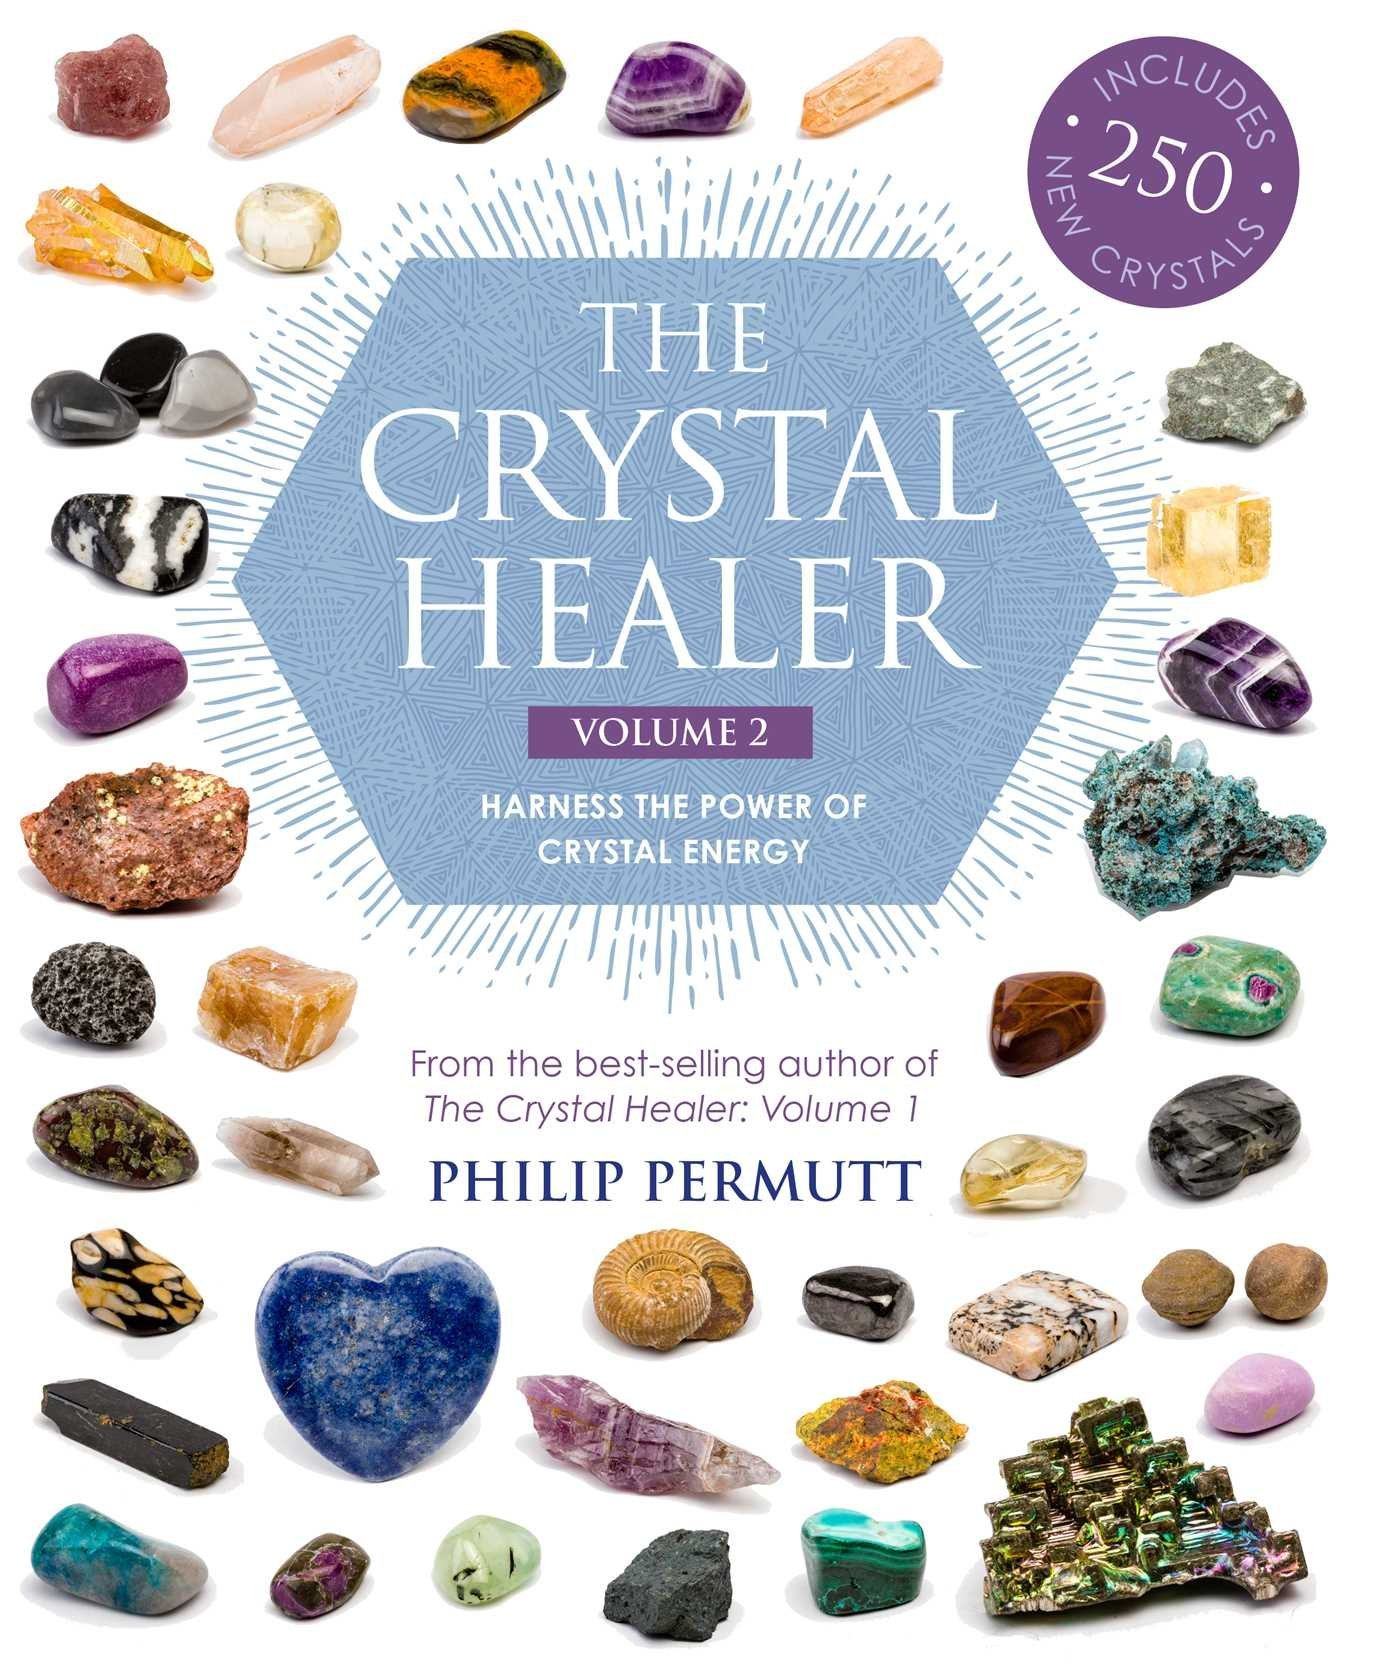 The_Crystal_Healer_Volume_2_cover_1